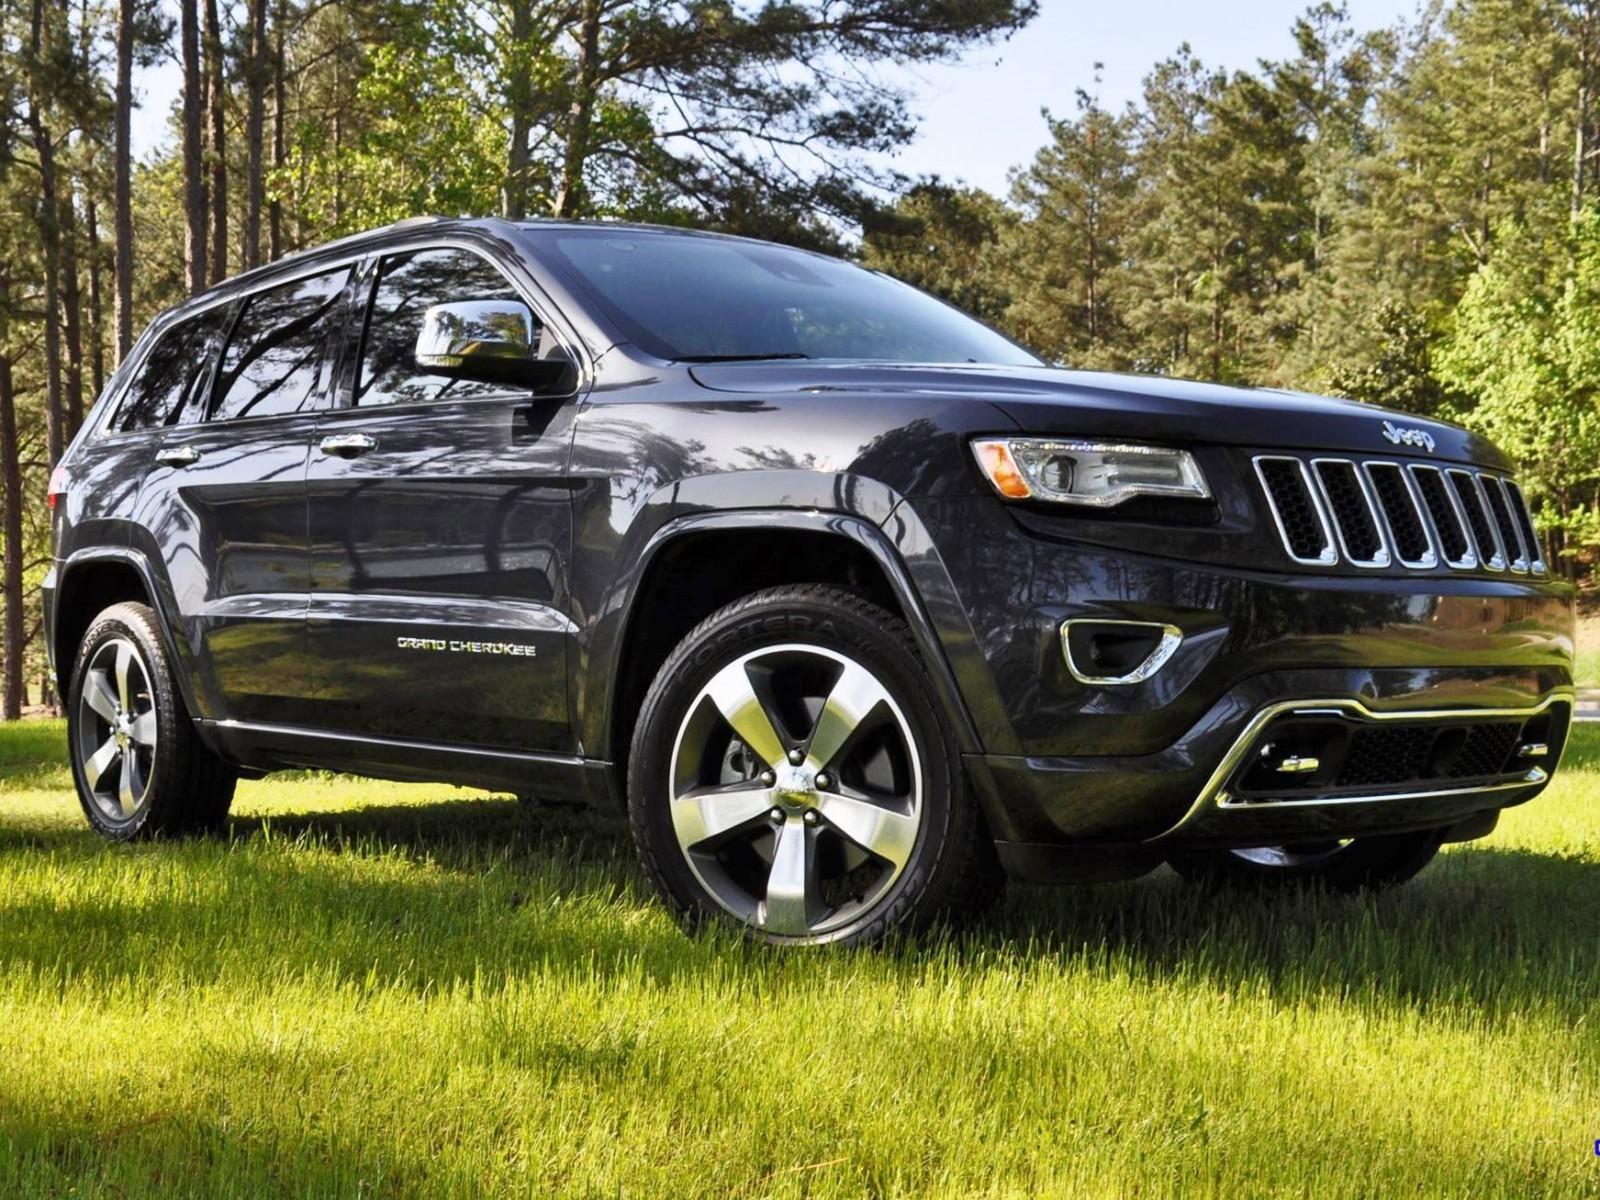 2015 jeep grand cherokee ecodiesel 9. Black Bedroom Furniture Sets. Home Design Ideas